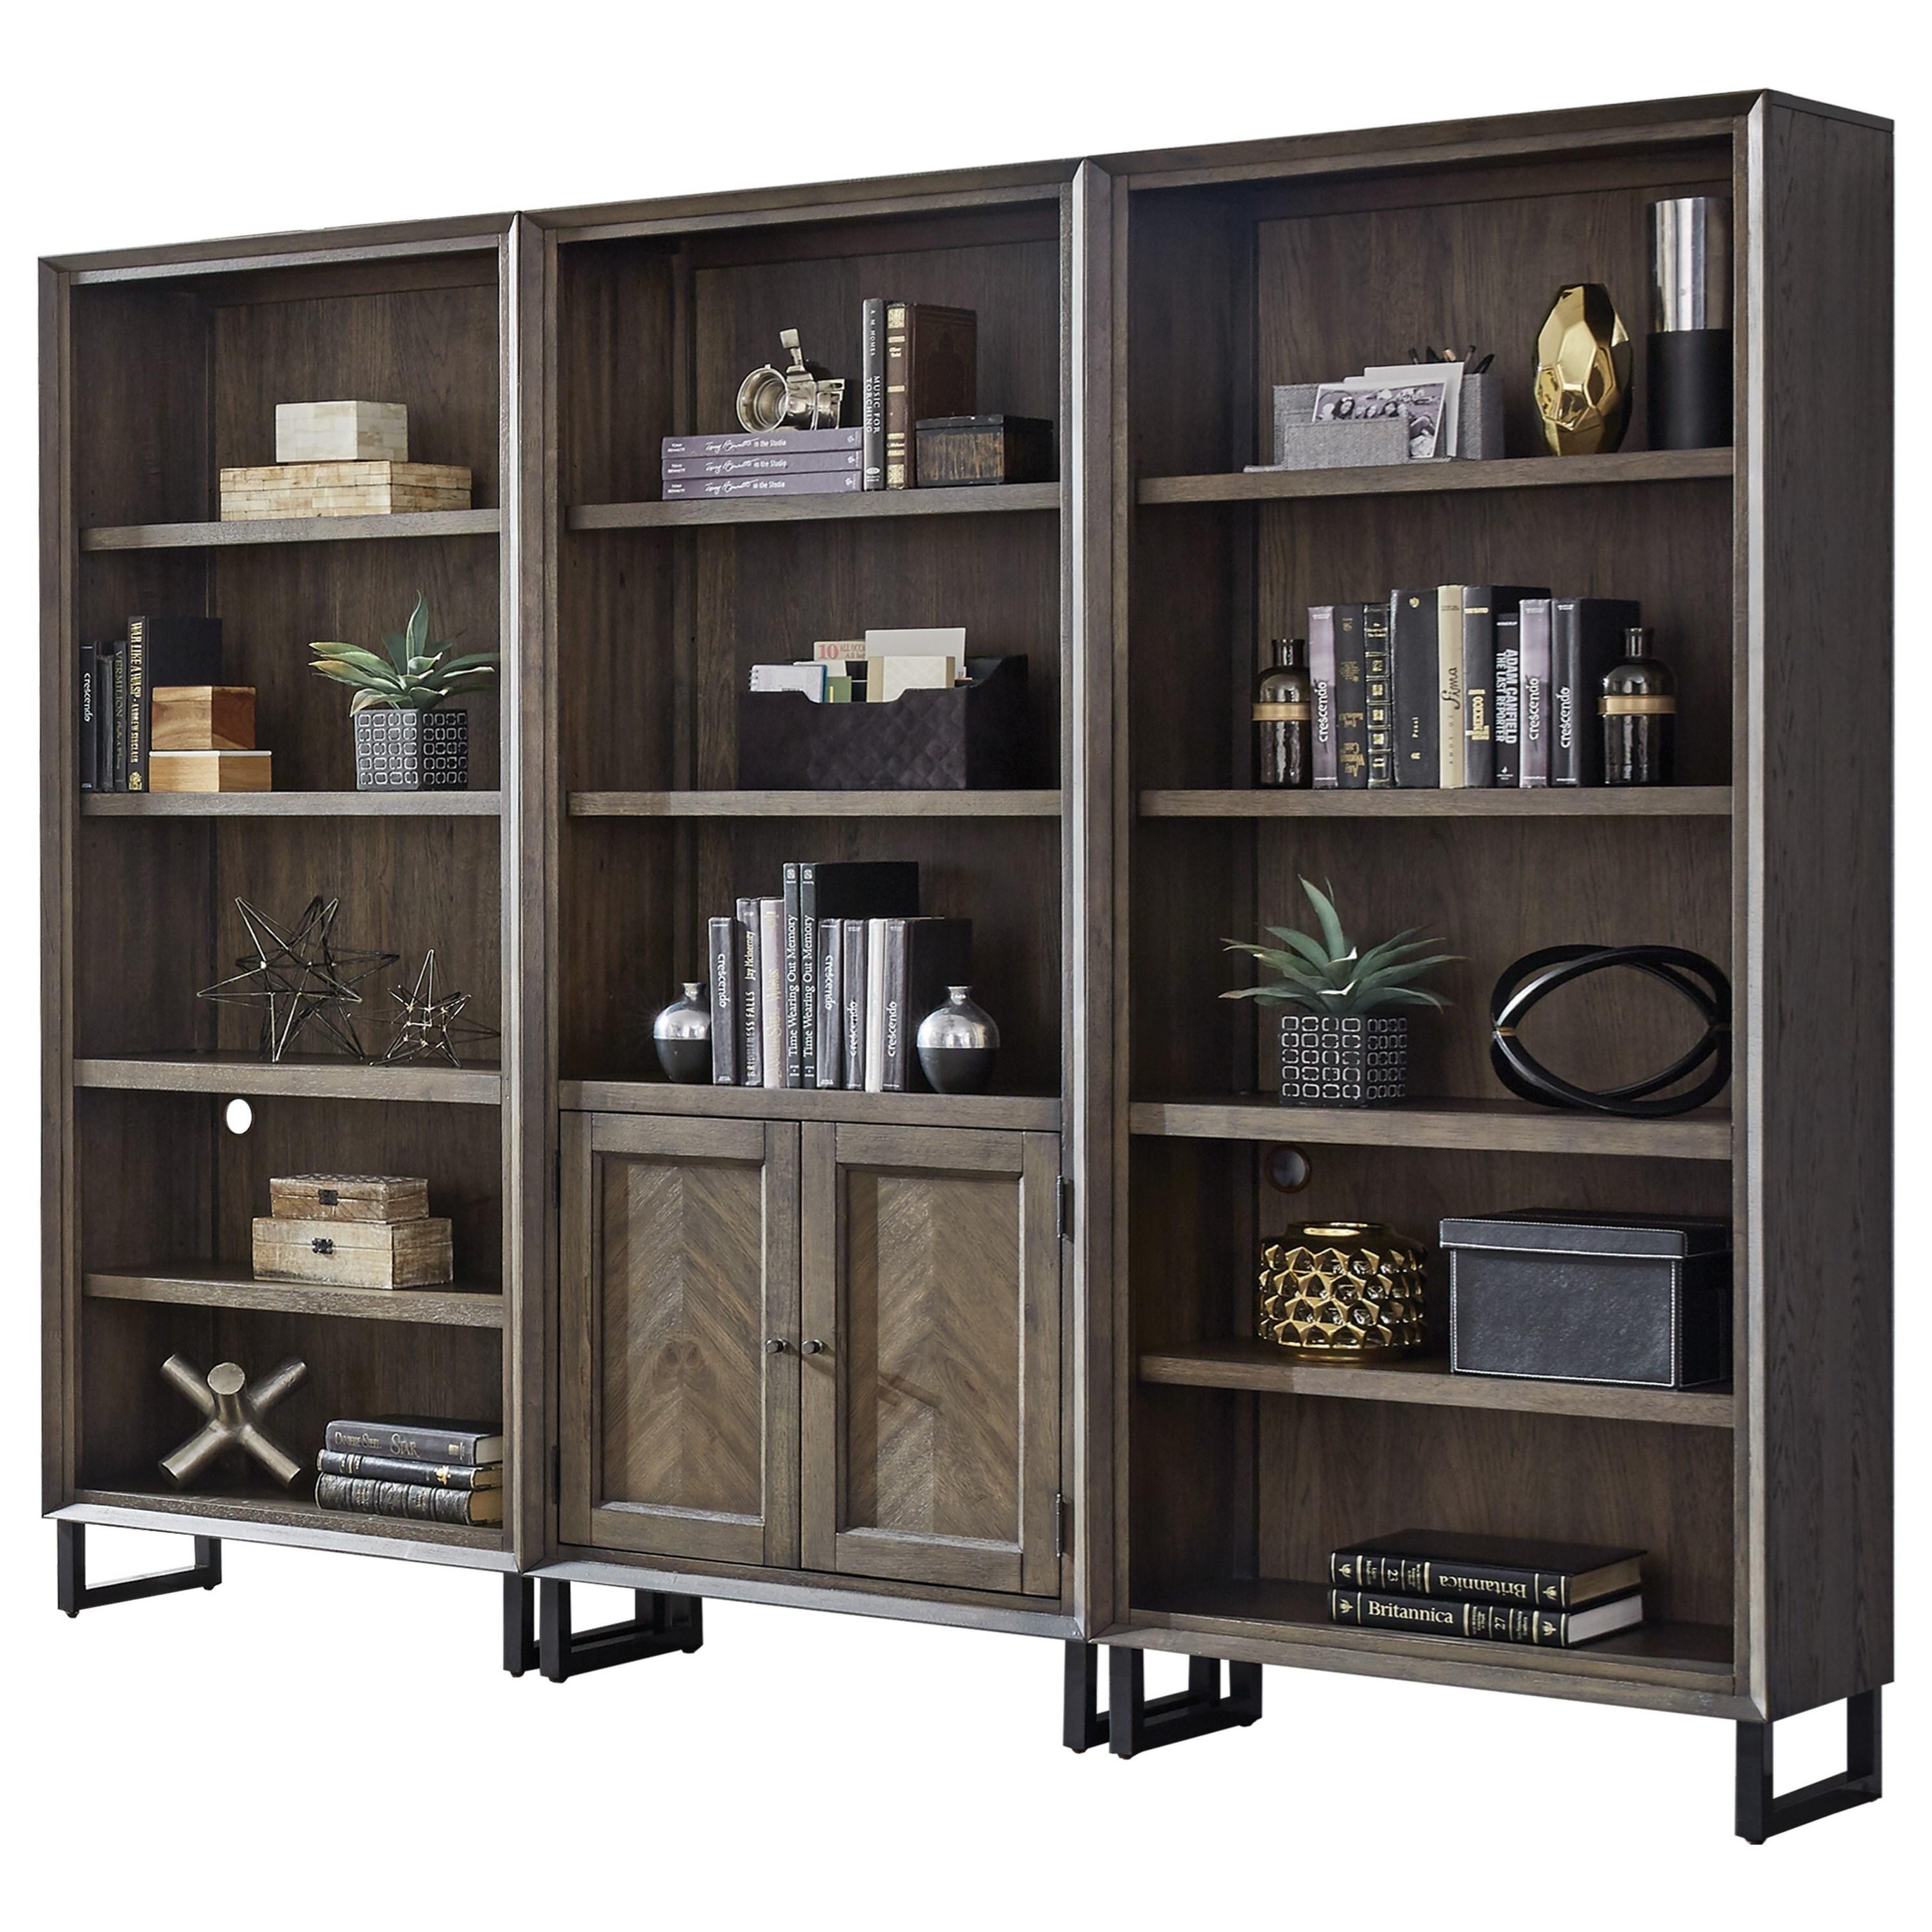 Harper Point Bookcase Set by Aspenhome at Baer's Furniture